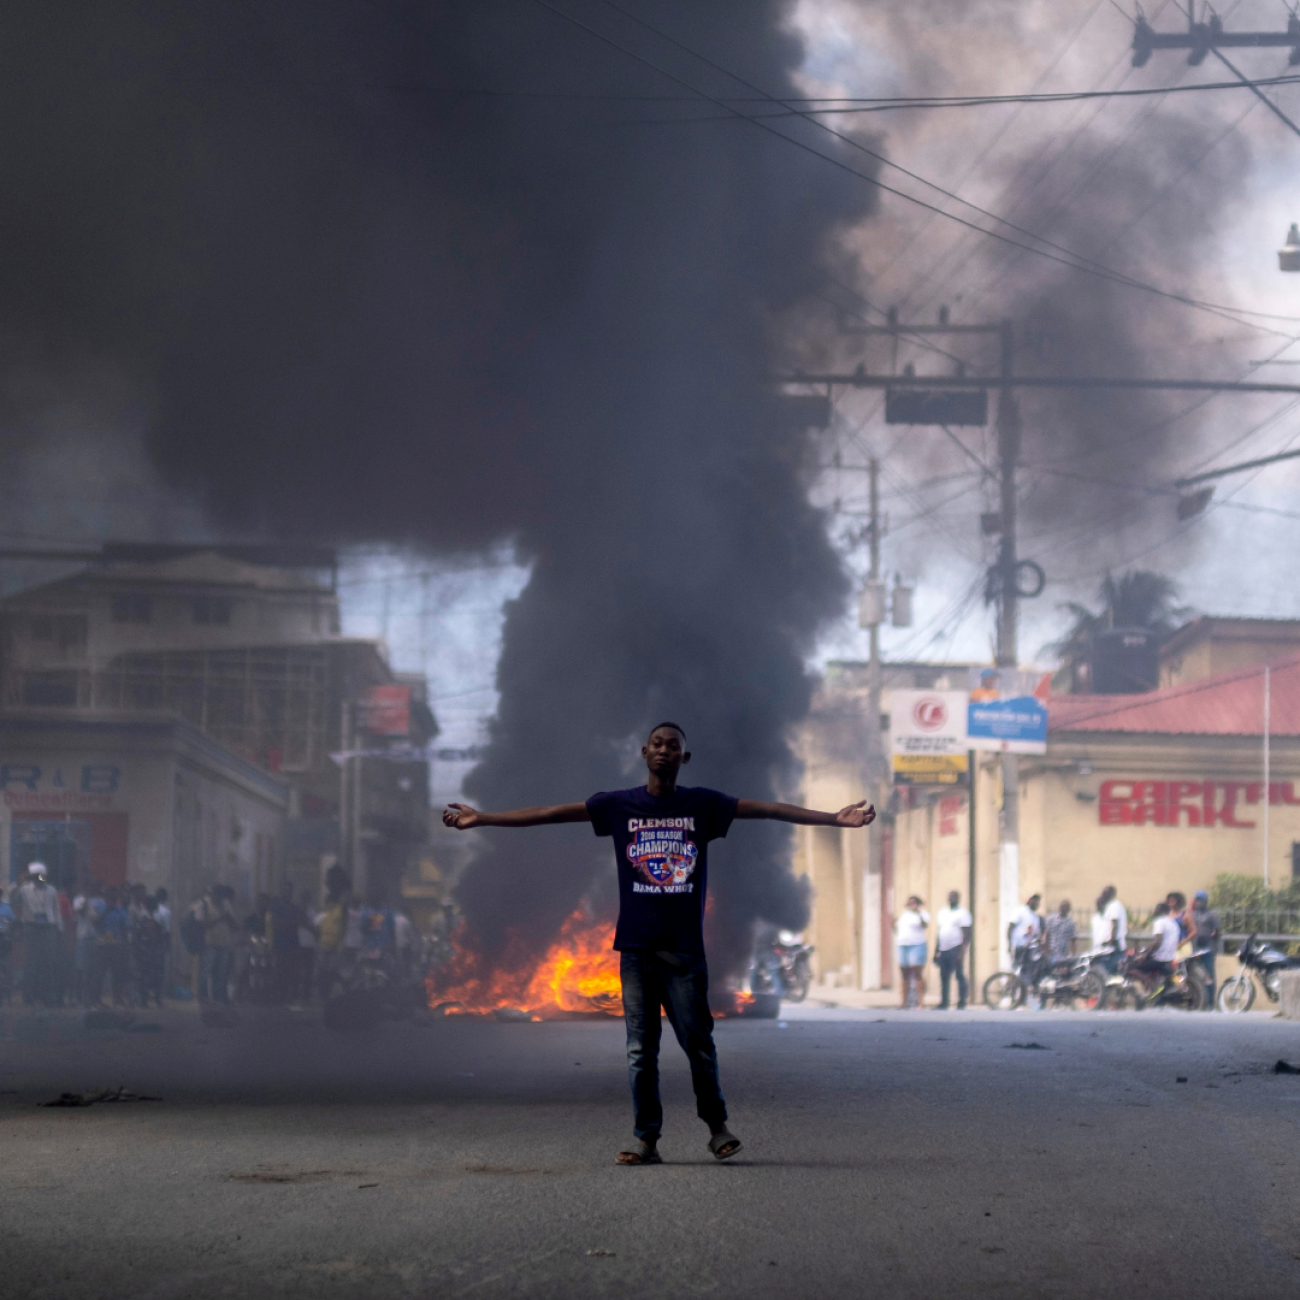 https://www.thinkglobalhealth.org/sites/default/files/styles/max_1300x1300_1_1/public/2021-07/Haiti%201.1.png?itok=oibFouSY